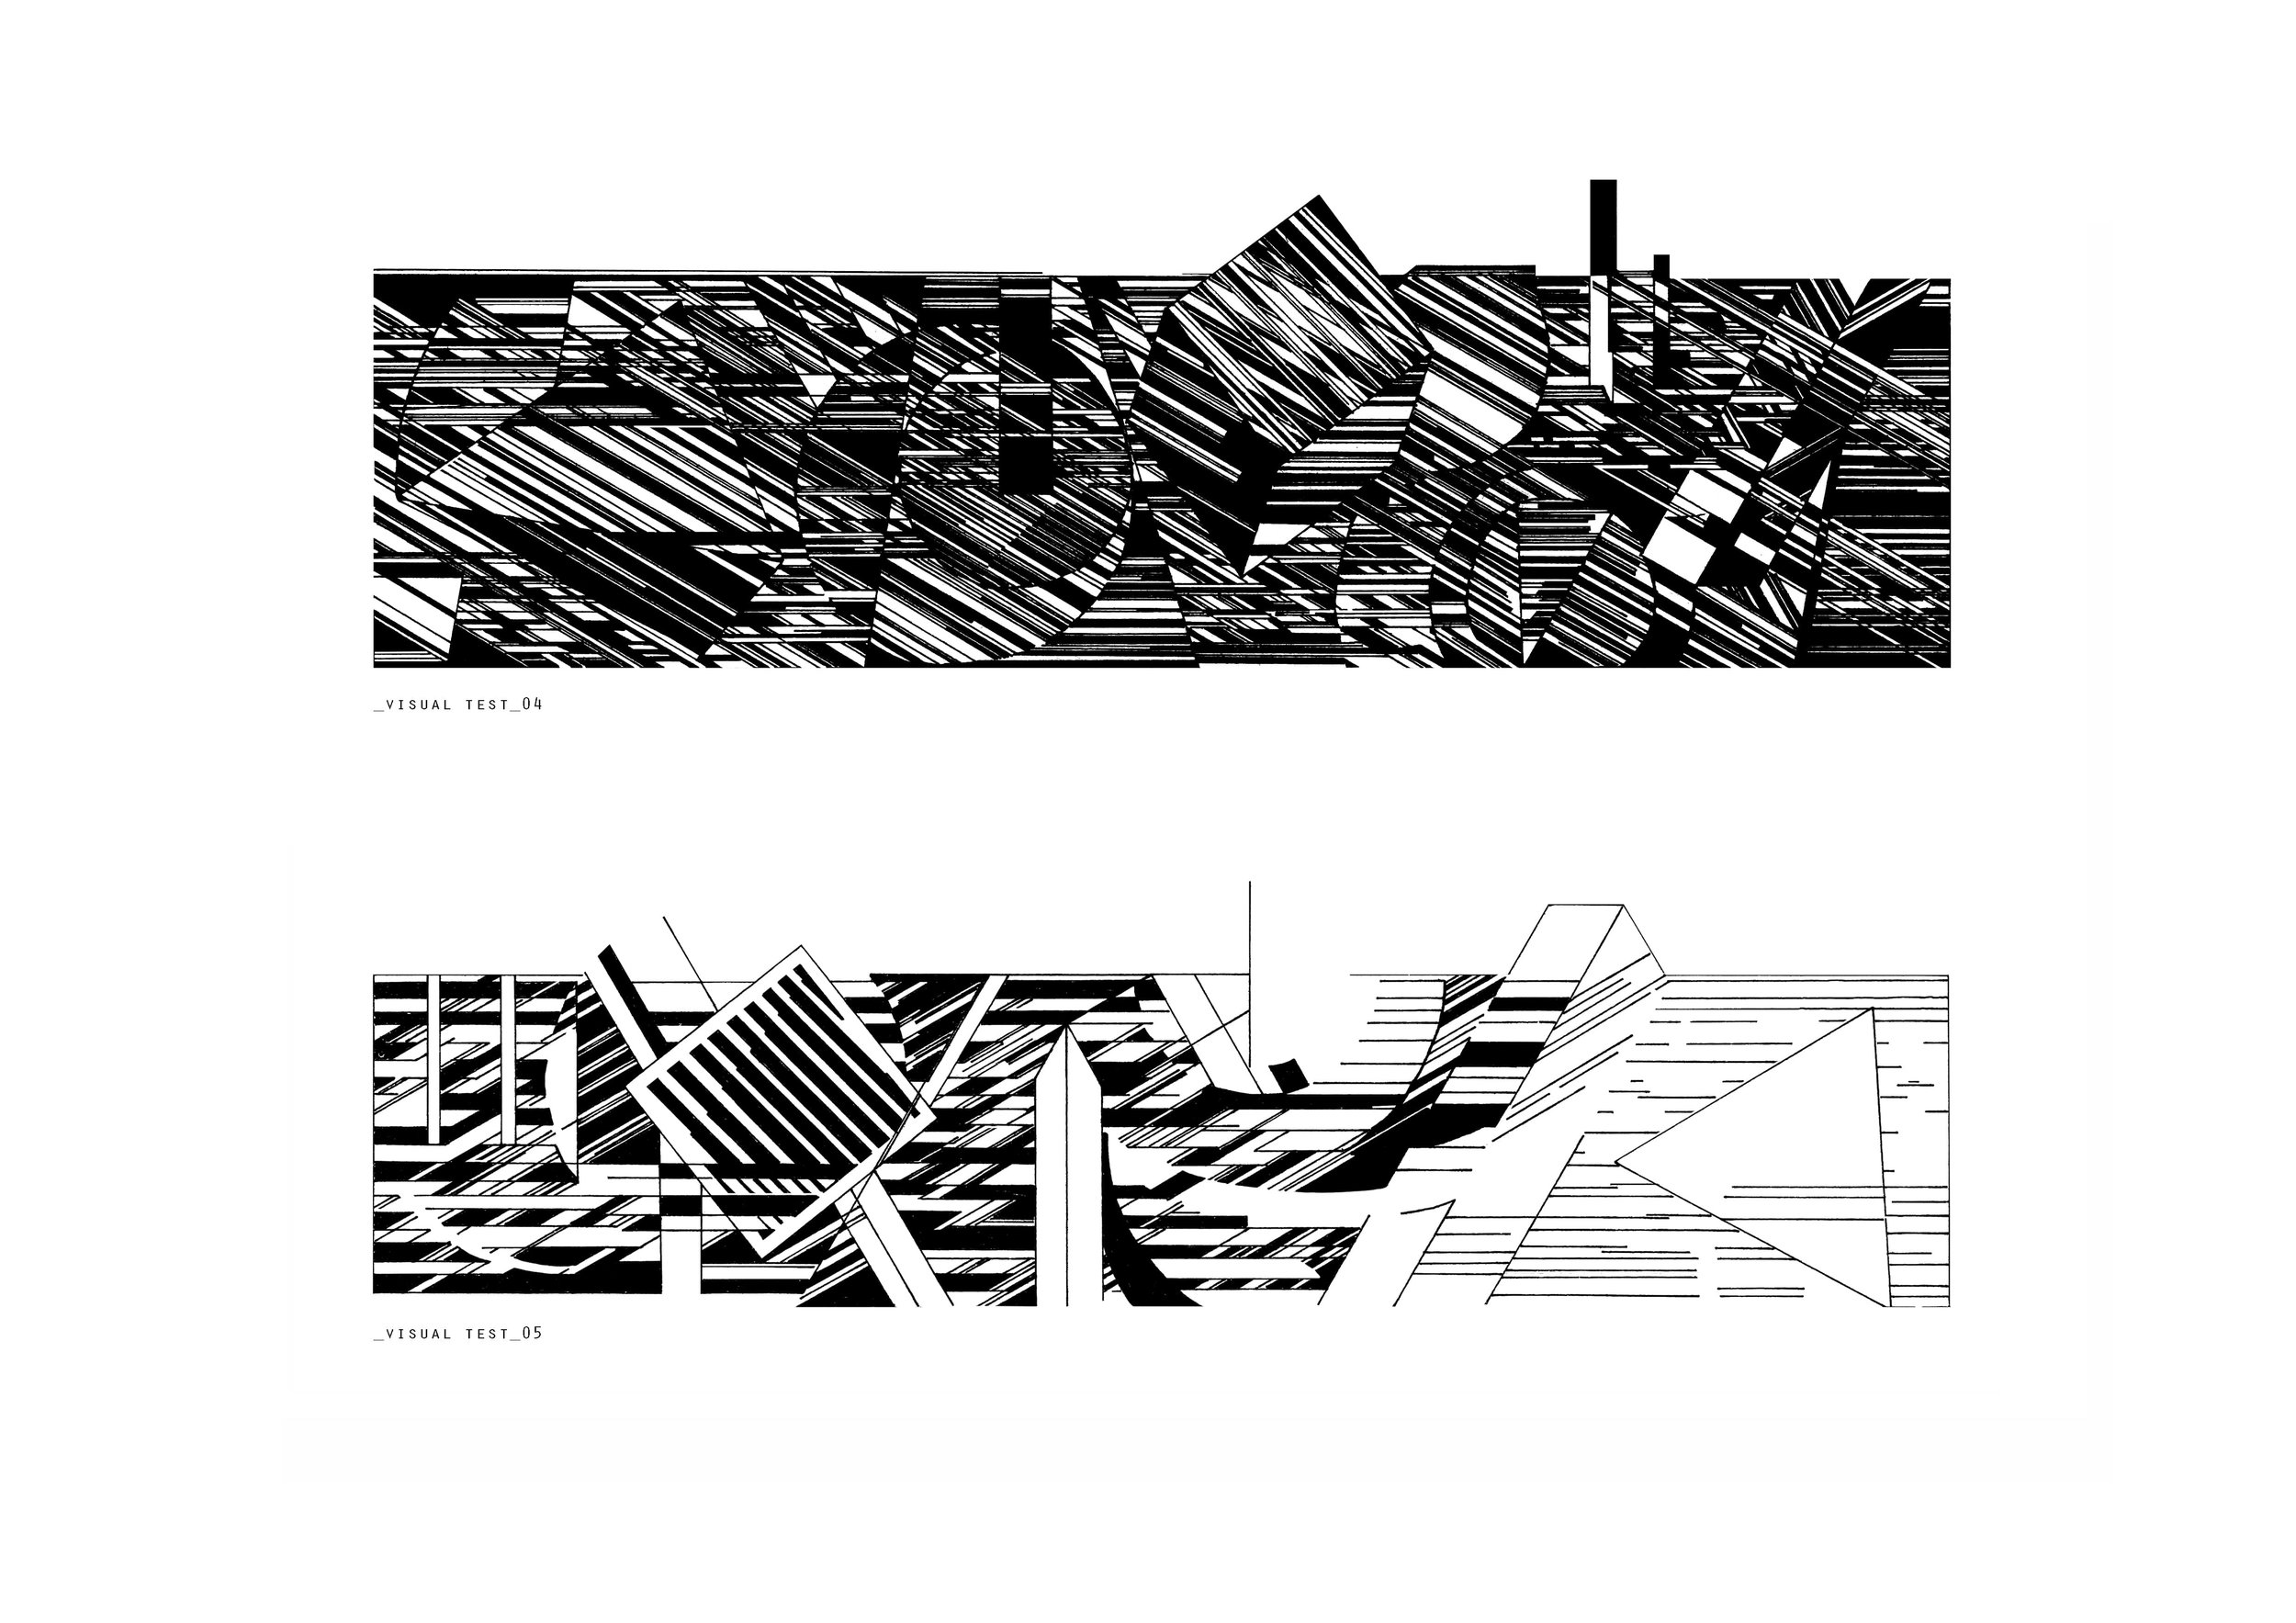 facade_testing_ileauxcygnes_paris_film_studio_complex_y3-min.jpg